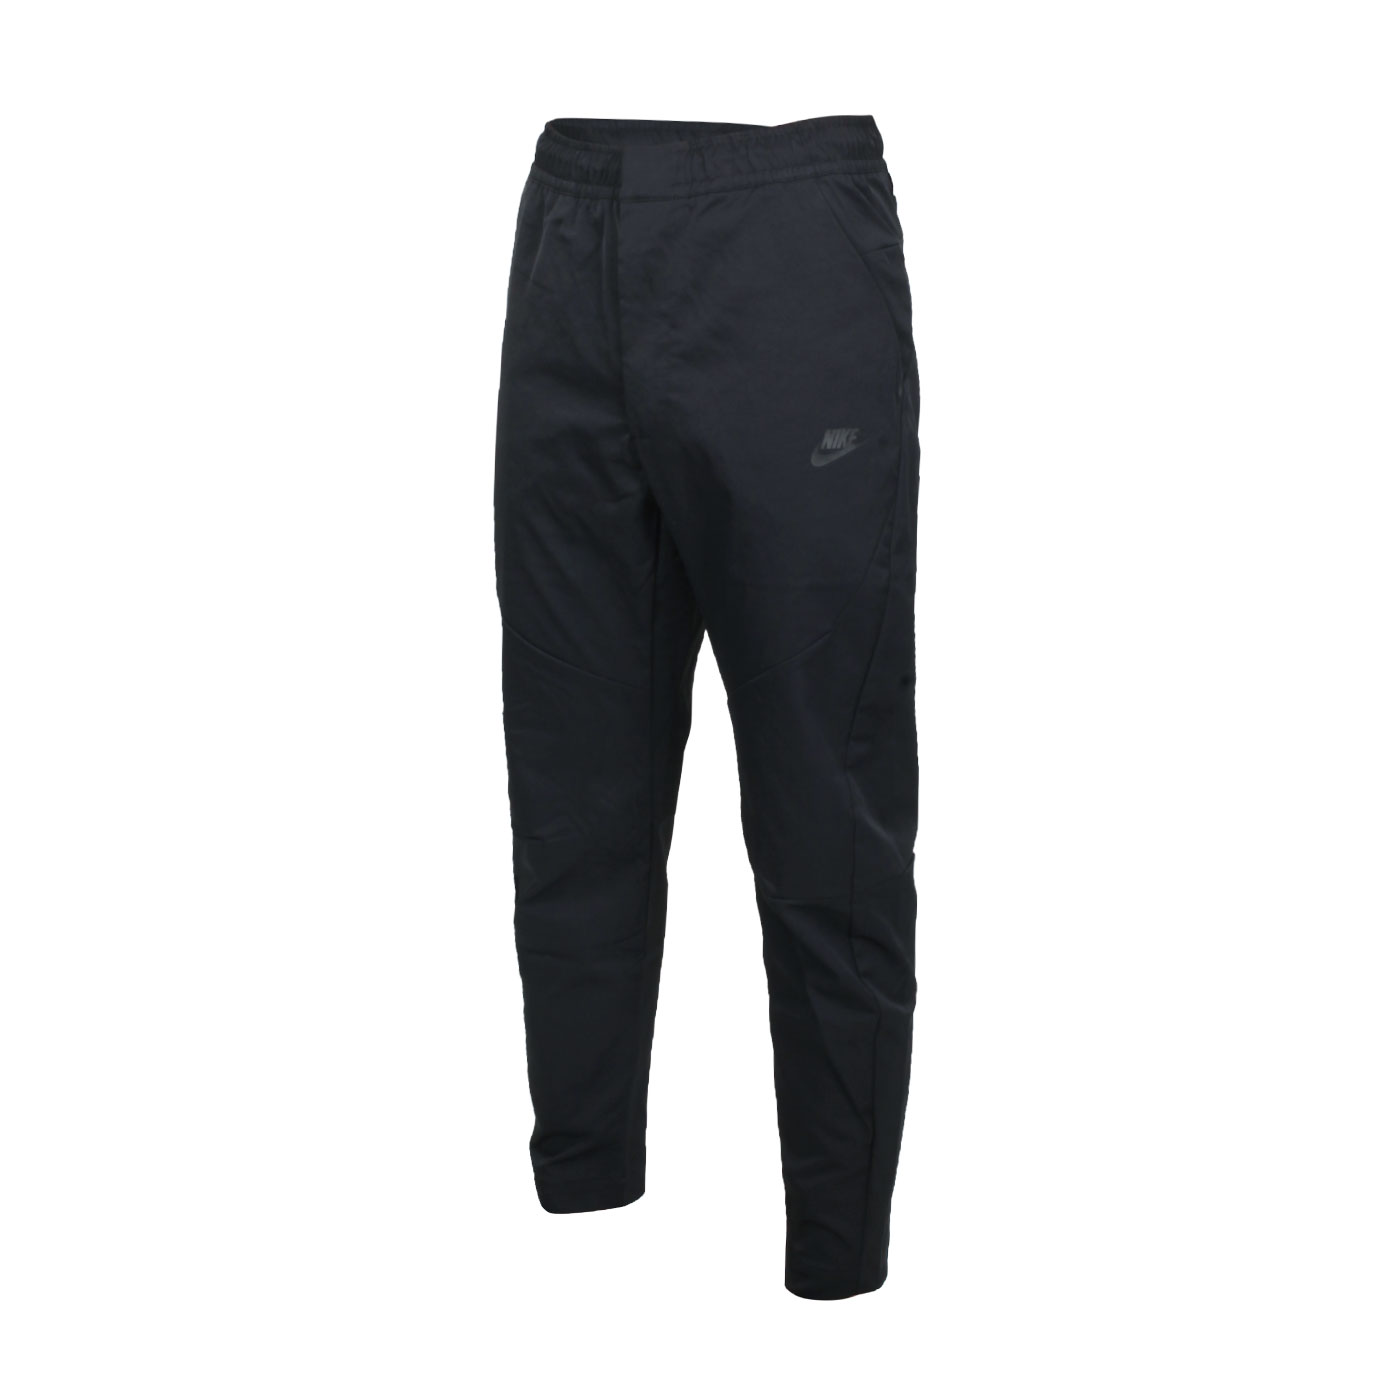 NIKE 男款休閒長褲 DH4225-010 - 黑